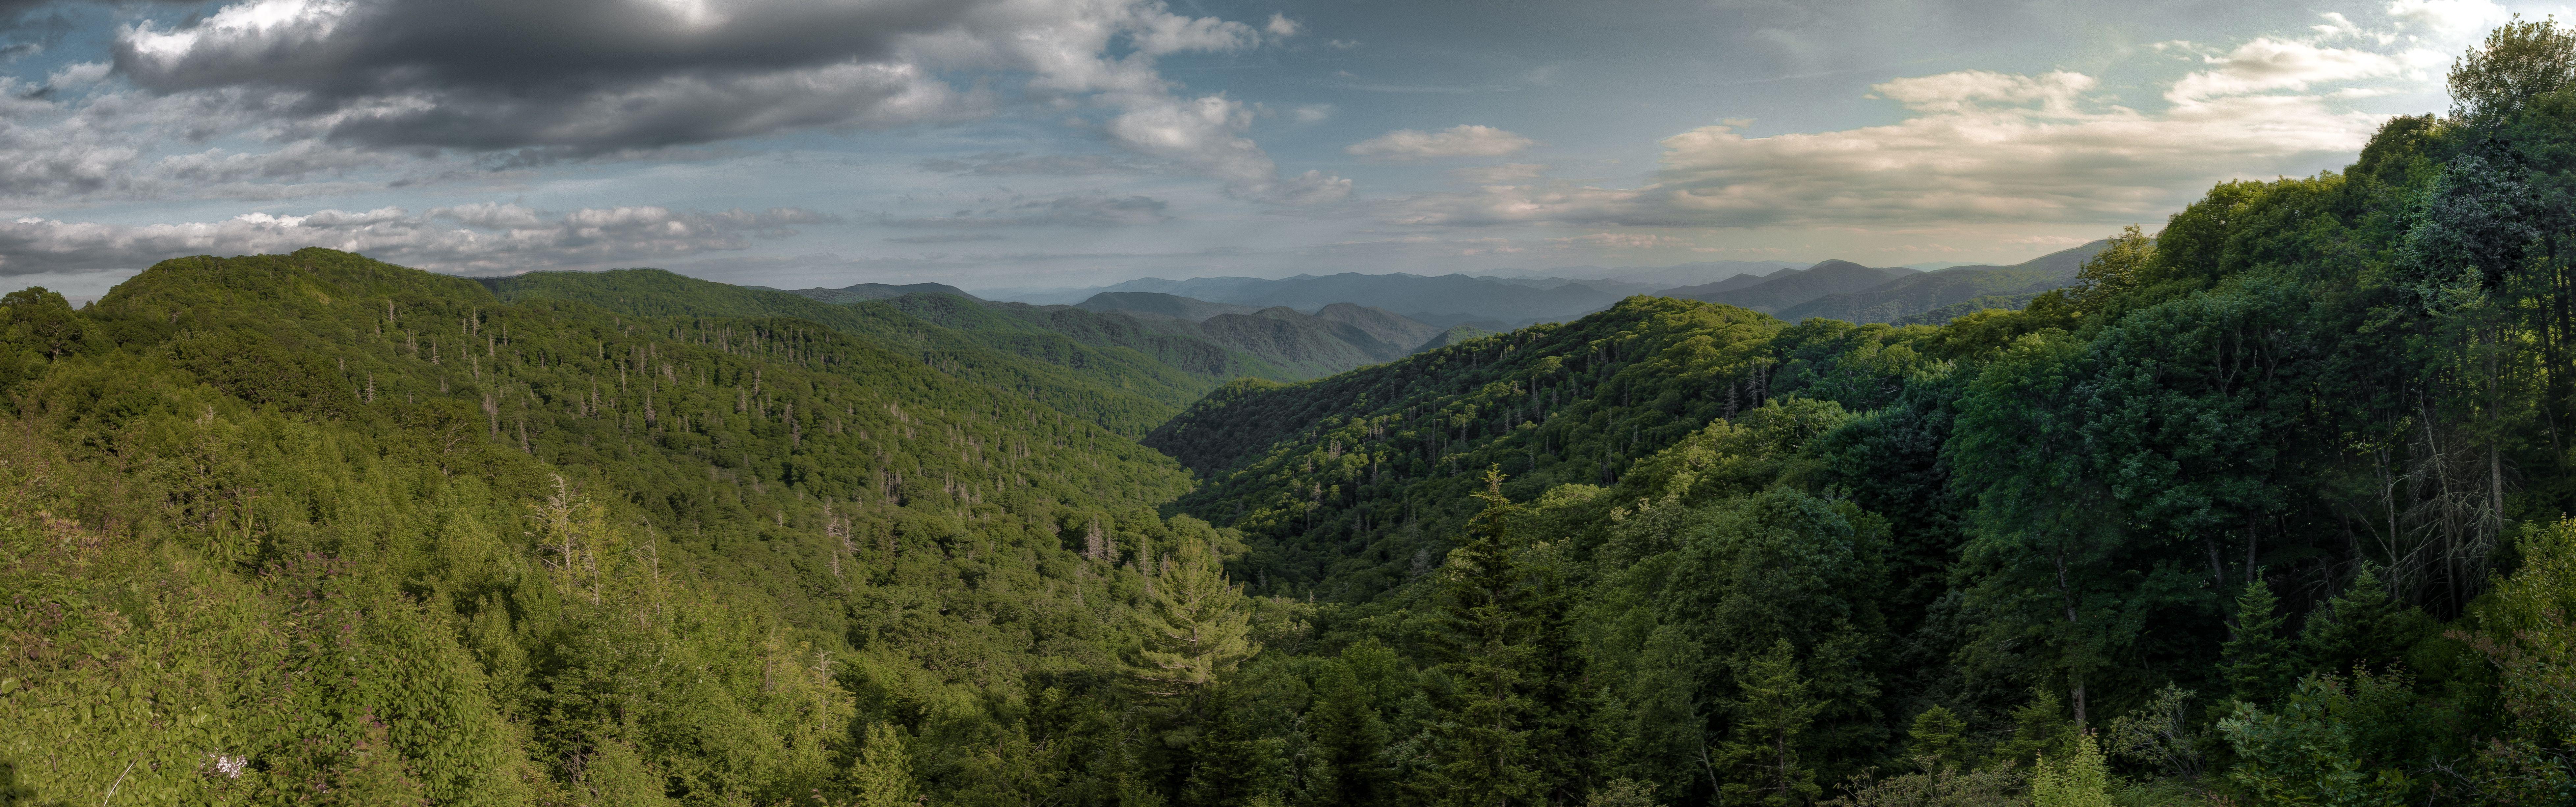 Great Smoky Mountains Panorama [7824x2450] [OC] http://ift.tt ...